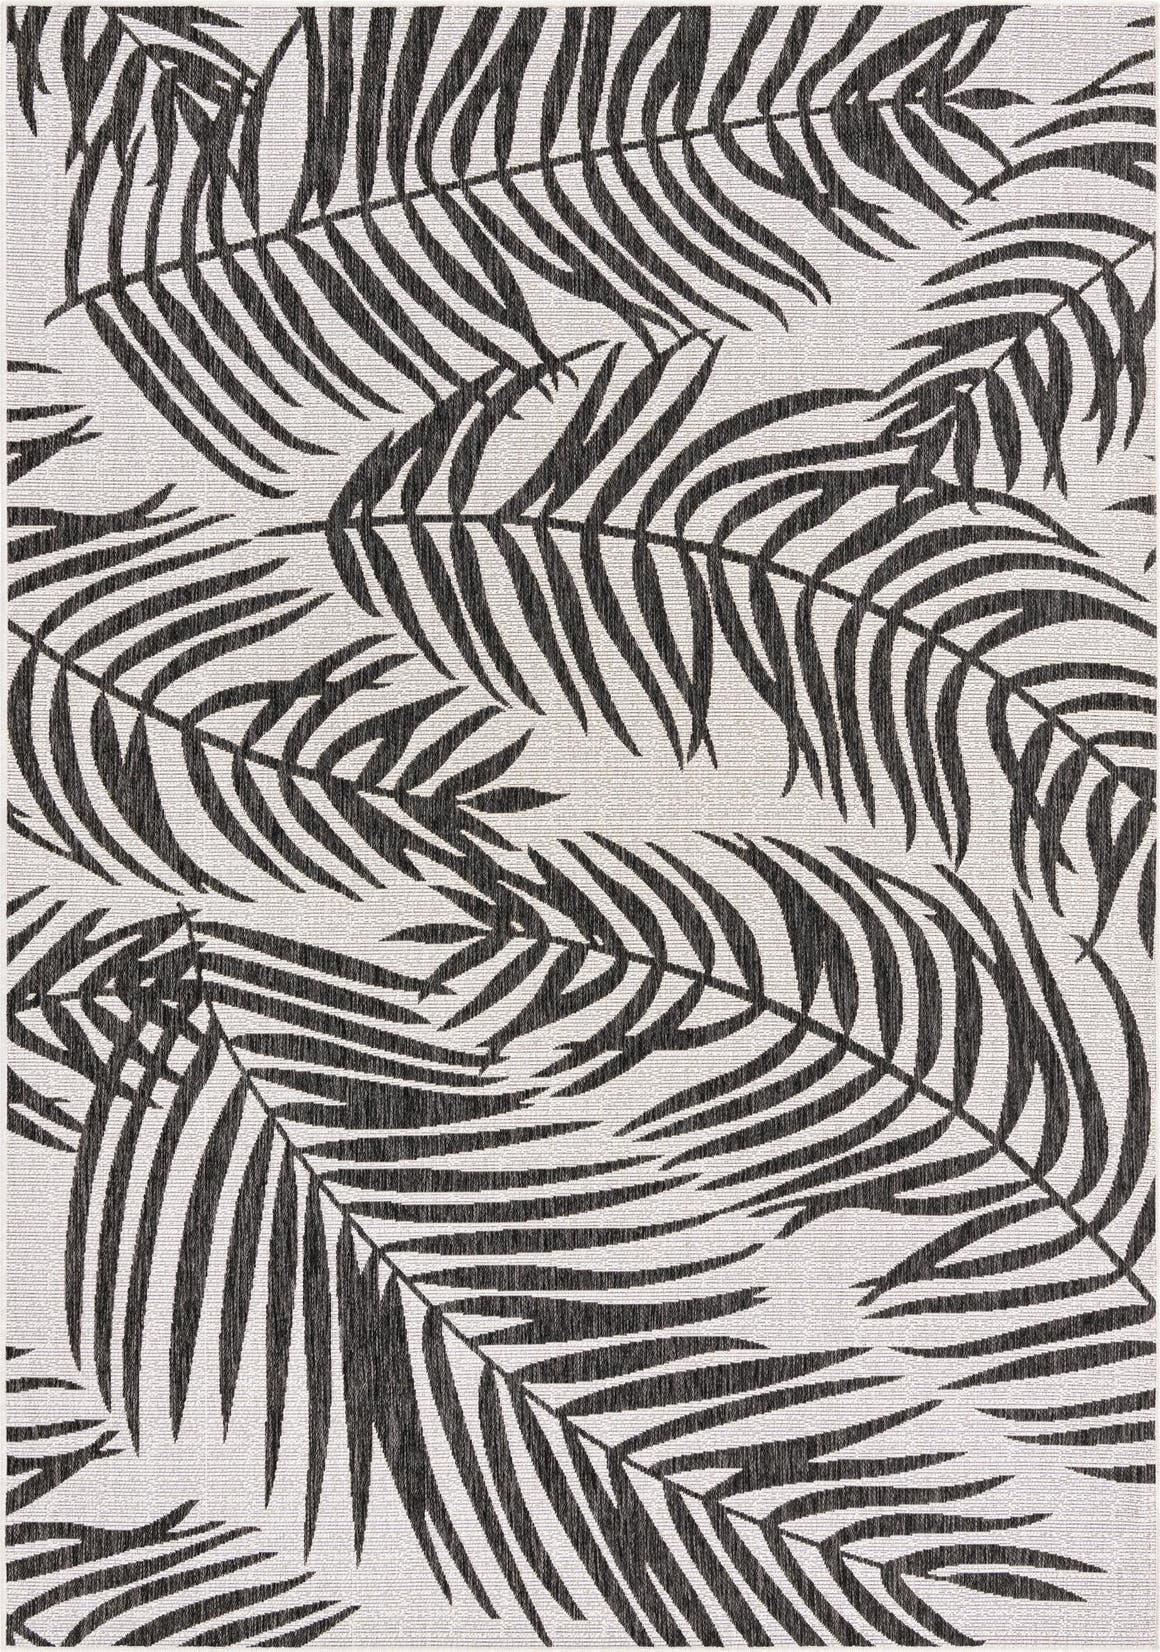 7' x 10' Outdoor Botanical Rug main image